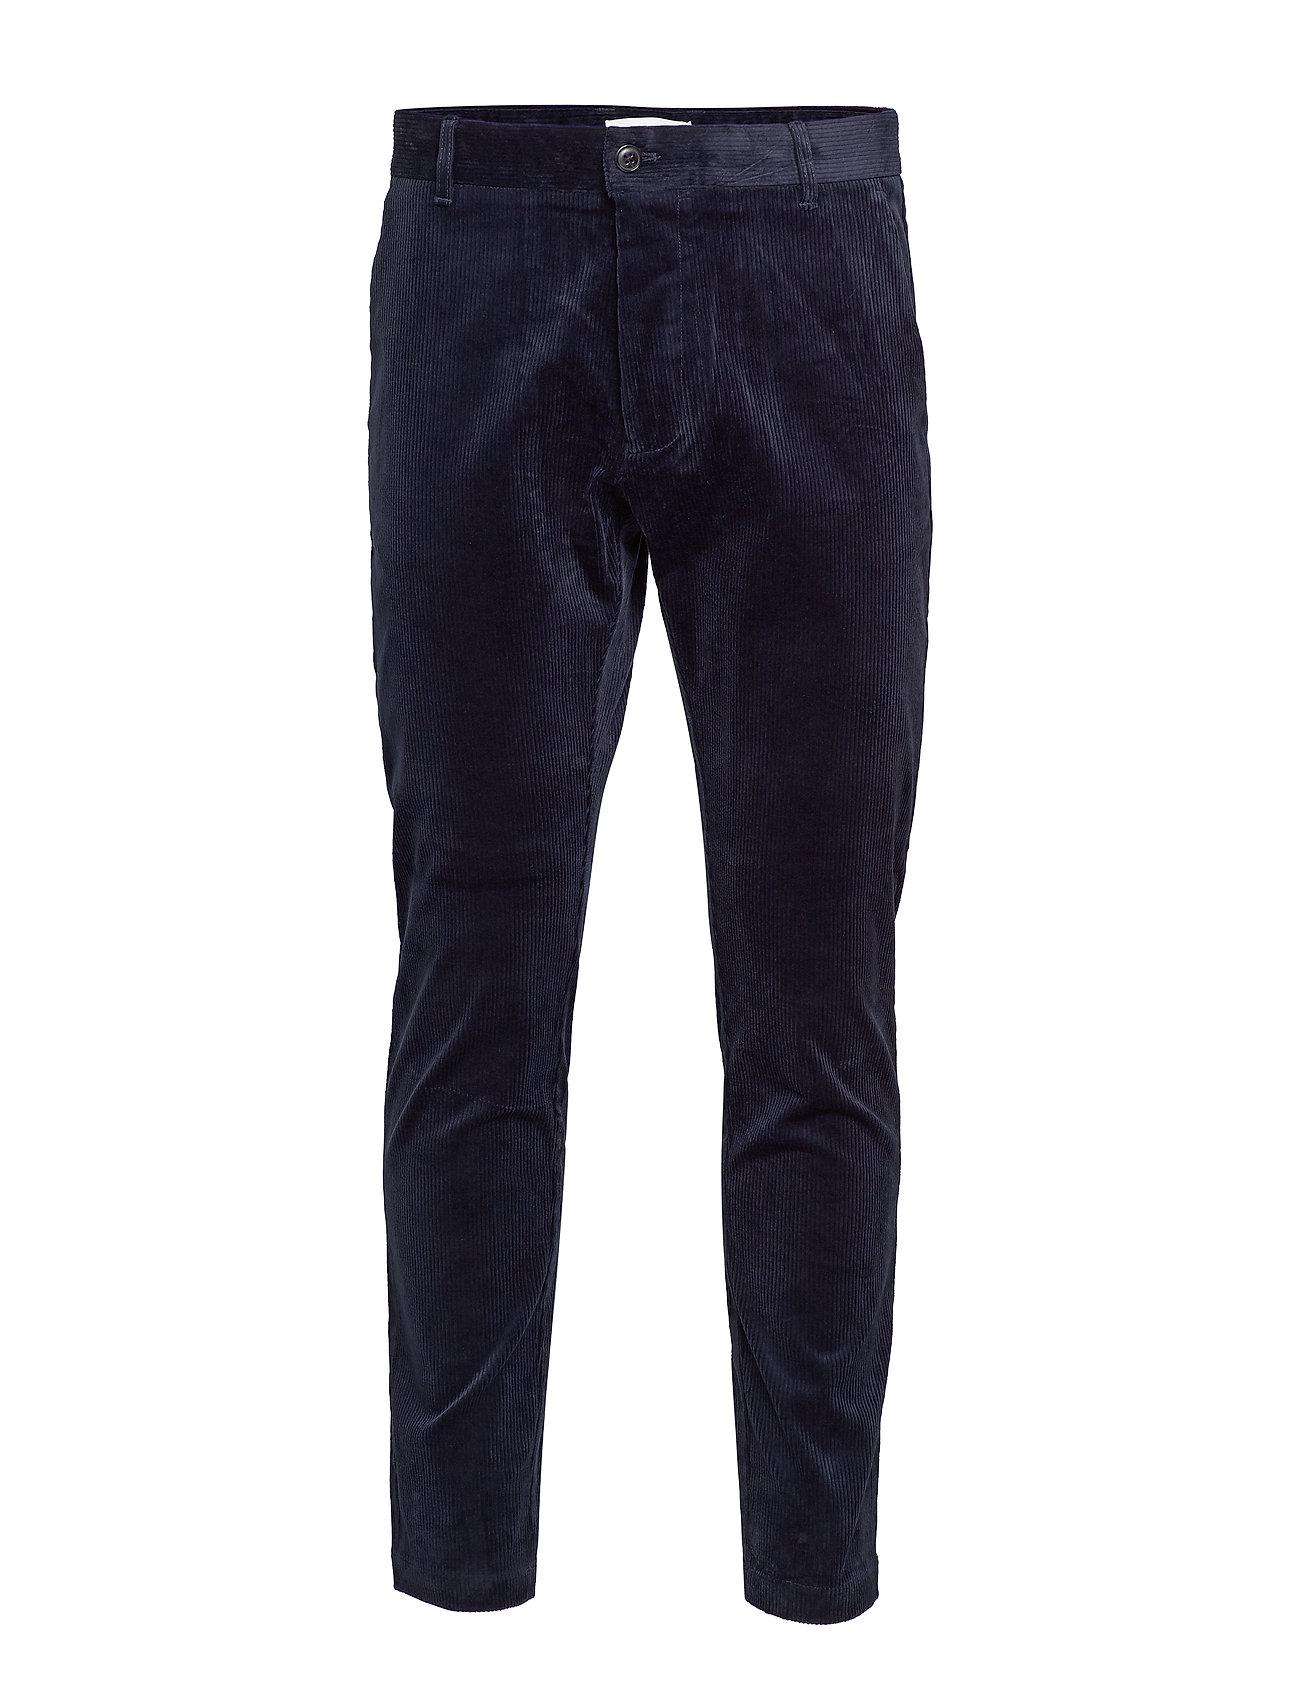 Samsøe & Samsøe Andy x trousers 11046 - NIGHT SKY